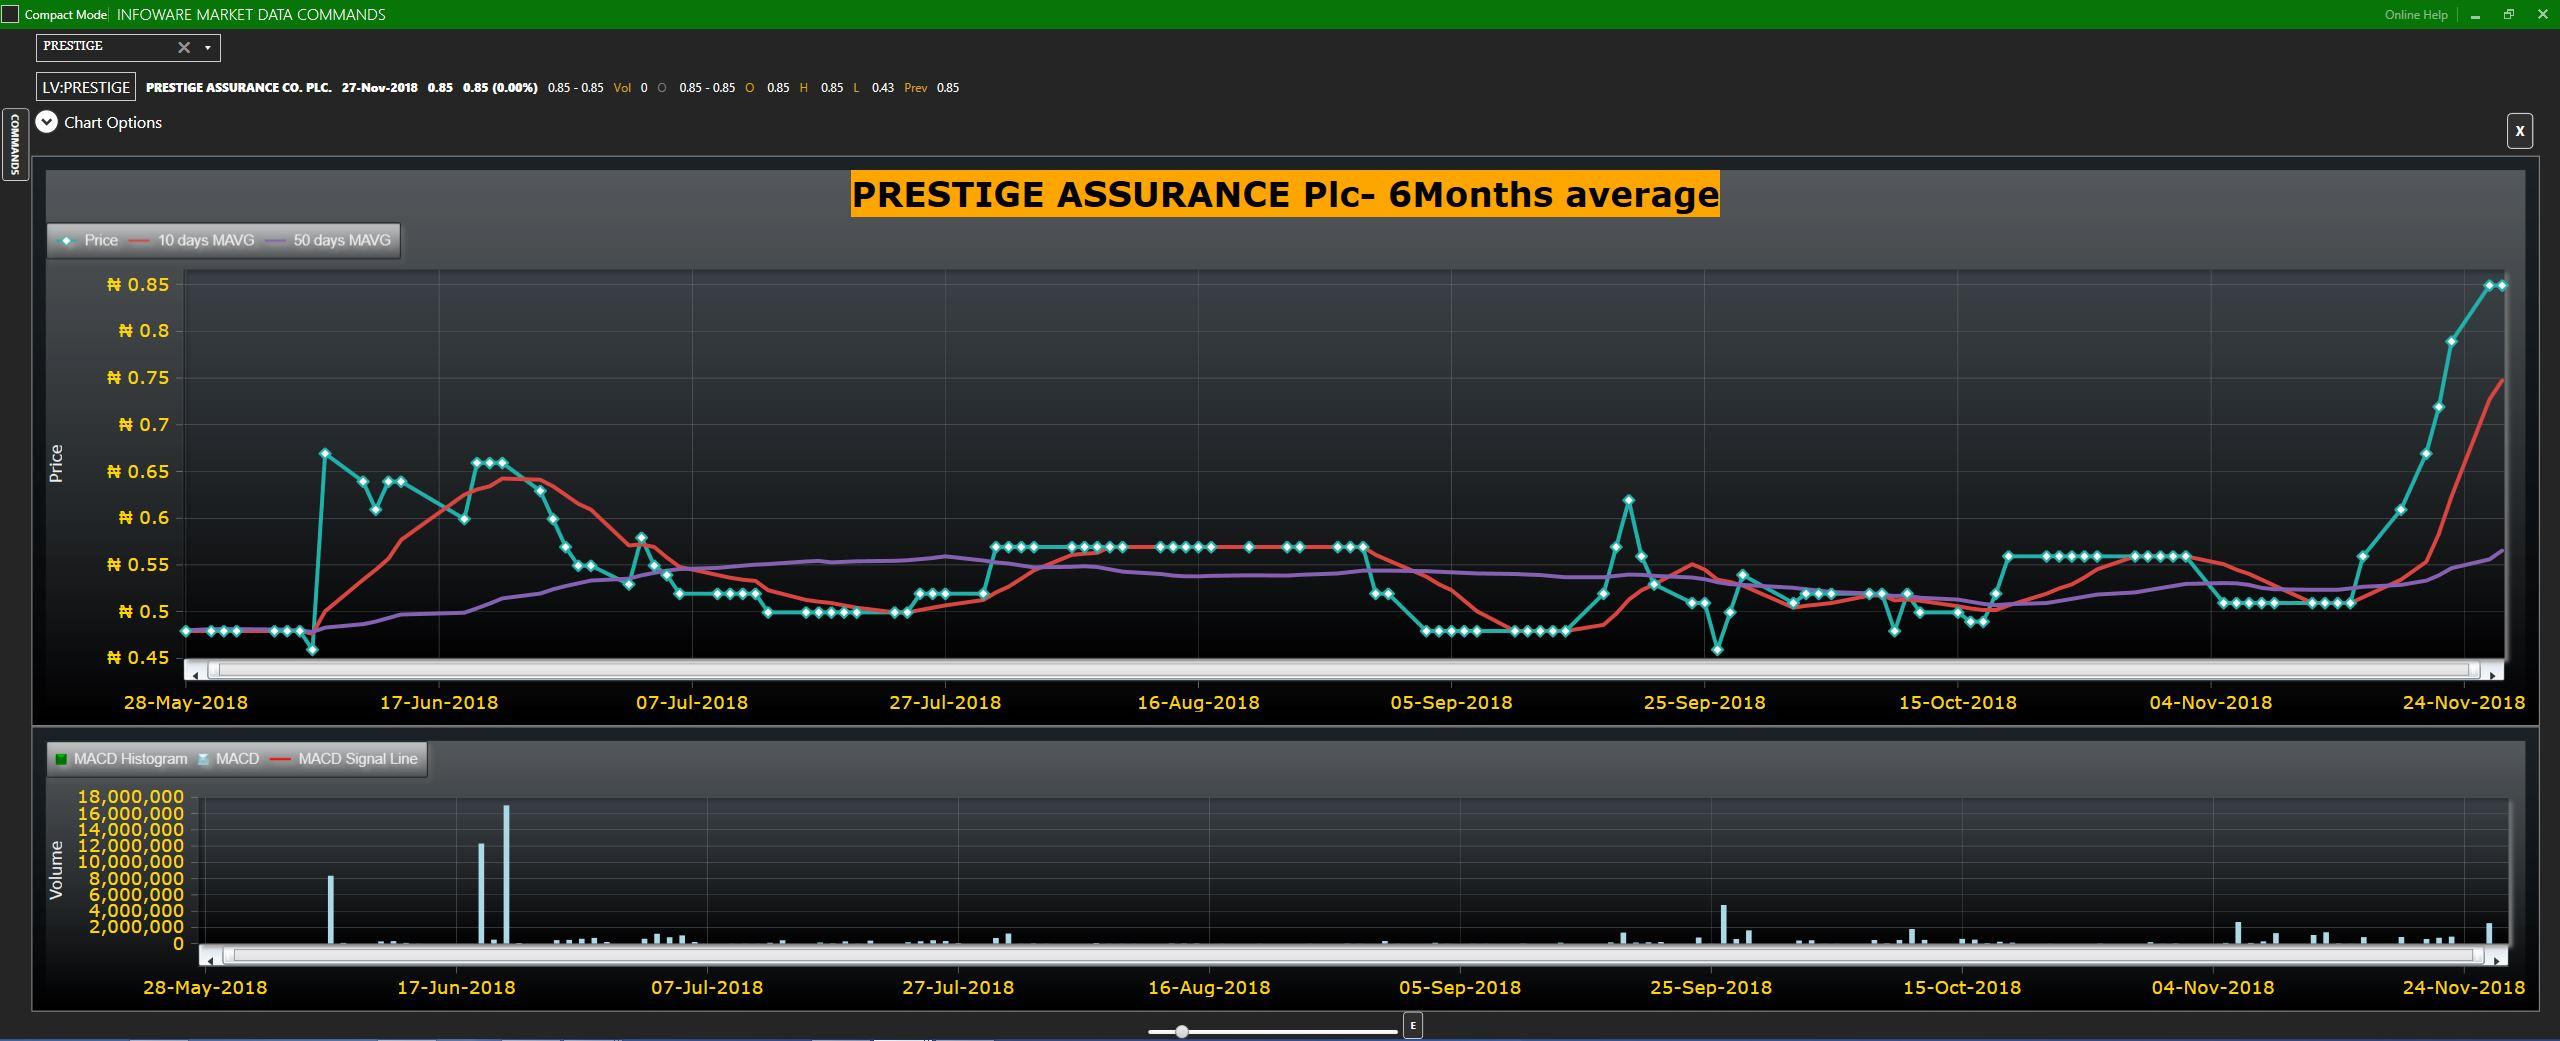 Prestige Assurance Plc IMDT